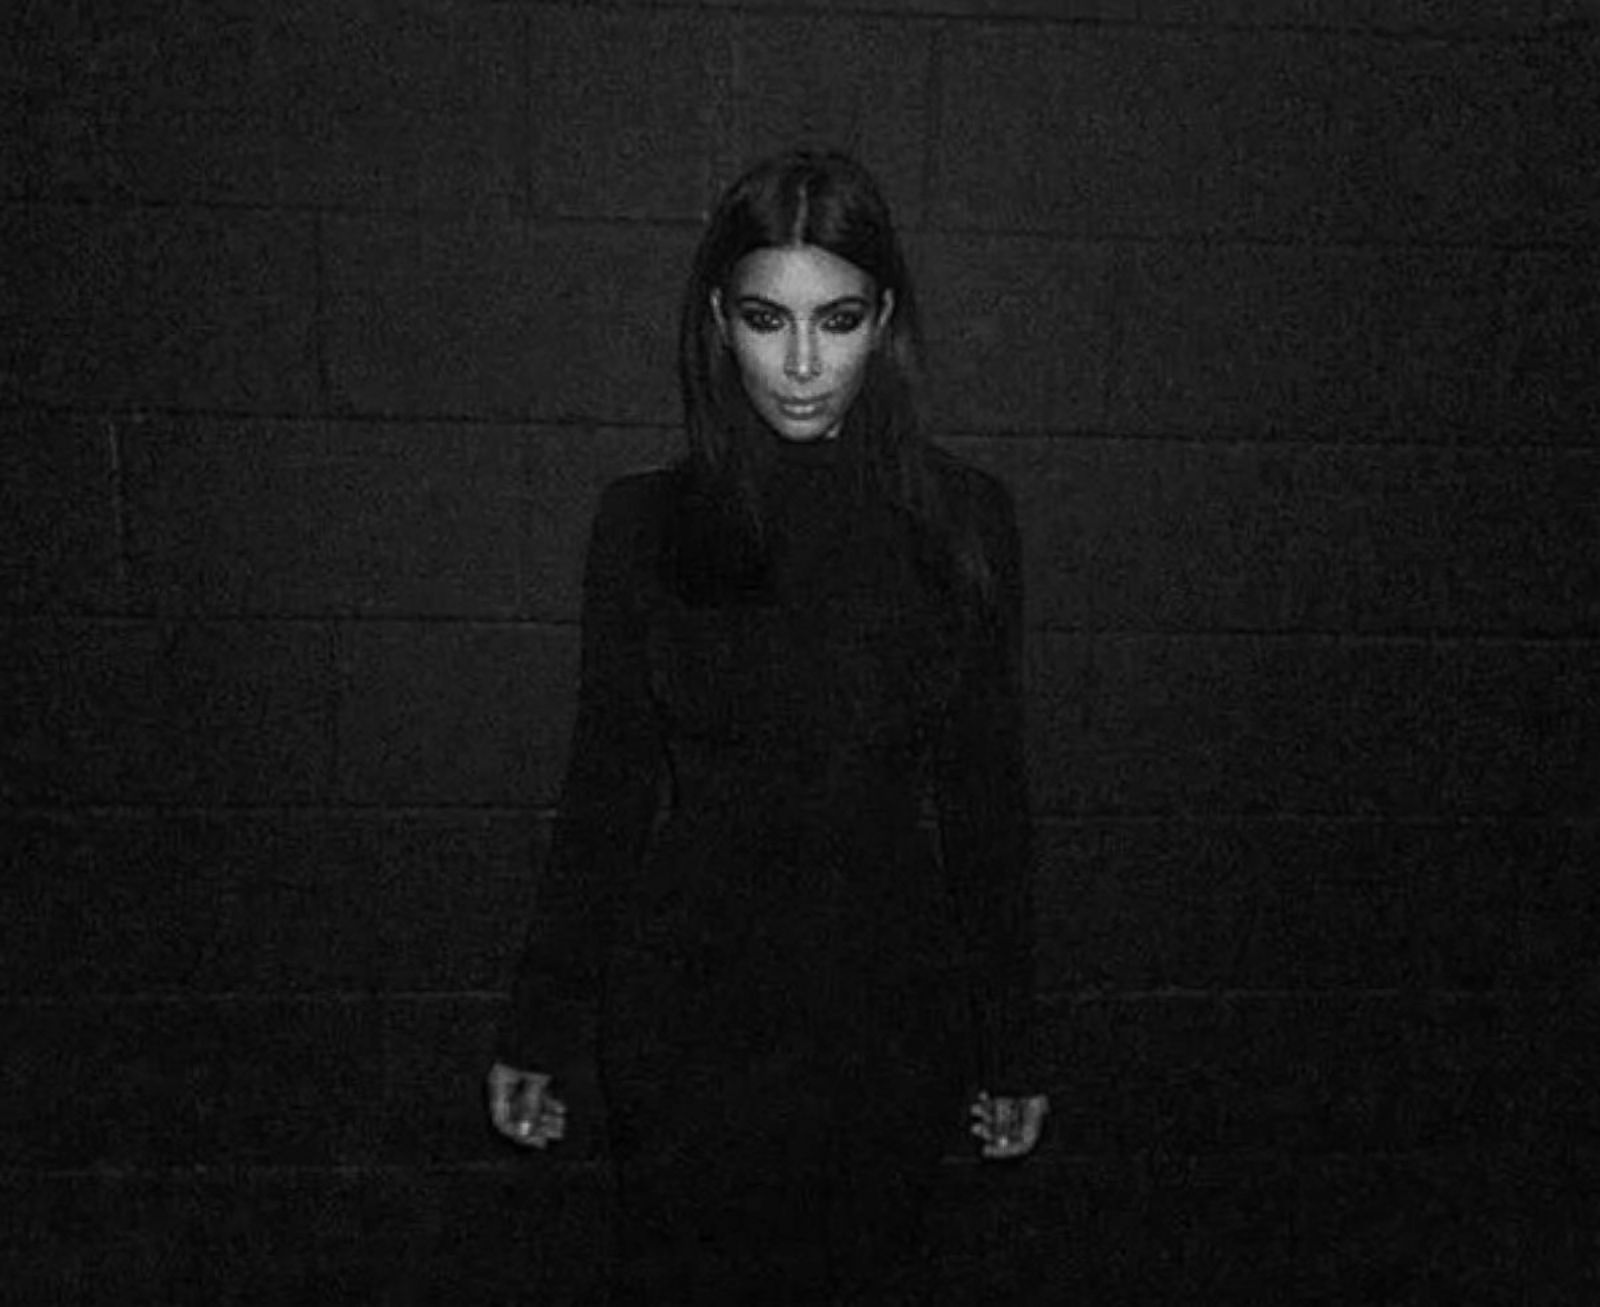 22cbe735ae Kim Kardashian Through the Years Photos - ABC News